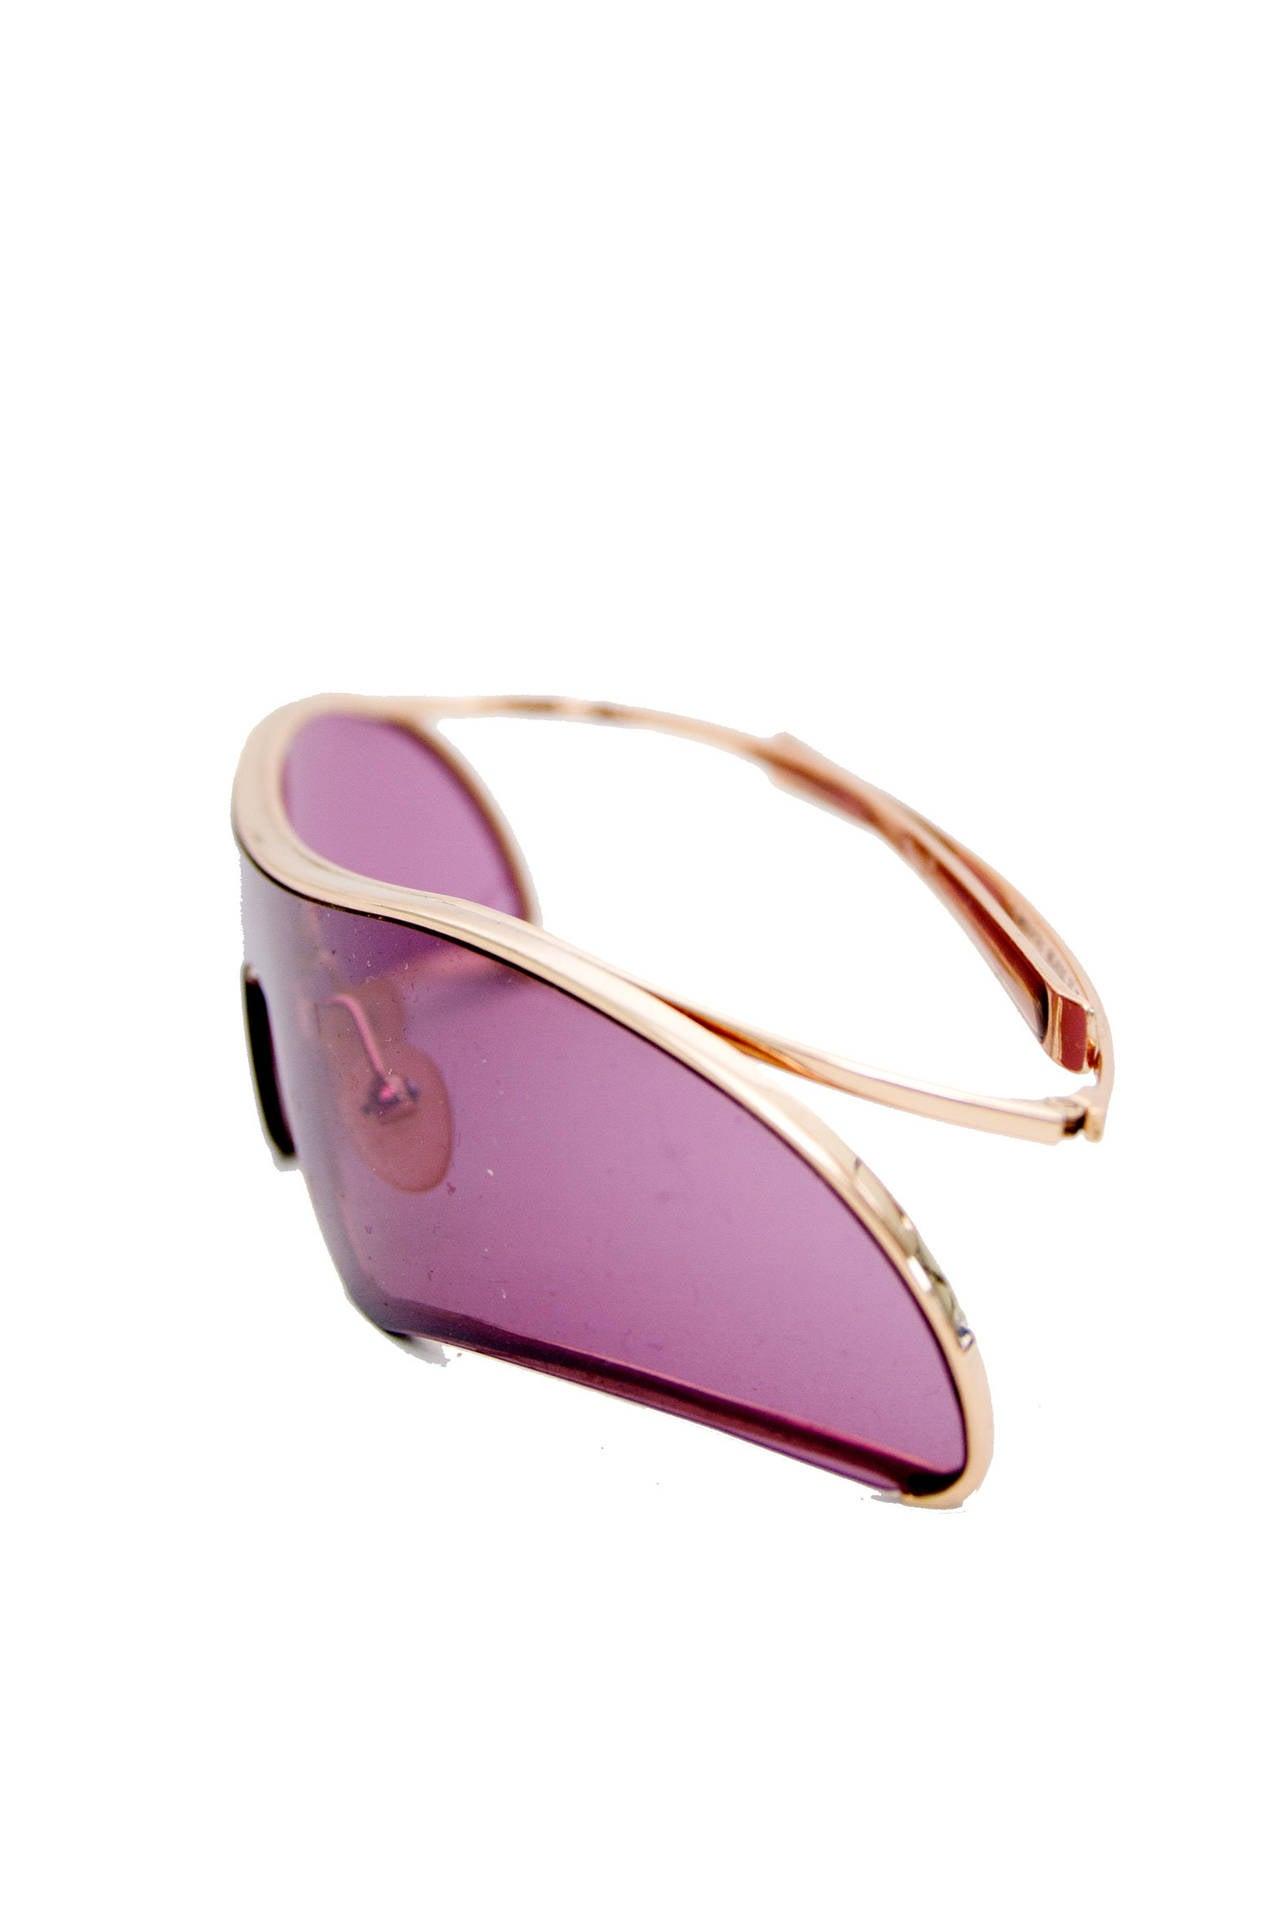 Brown Rare Alexander McQueen Sunglasses For Sale